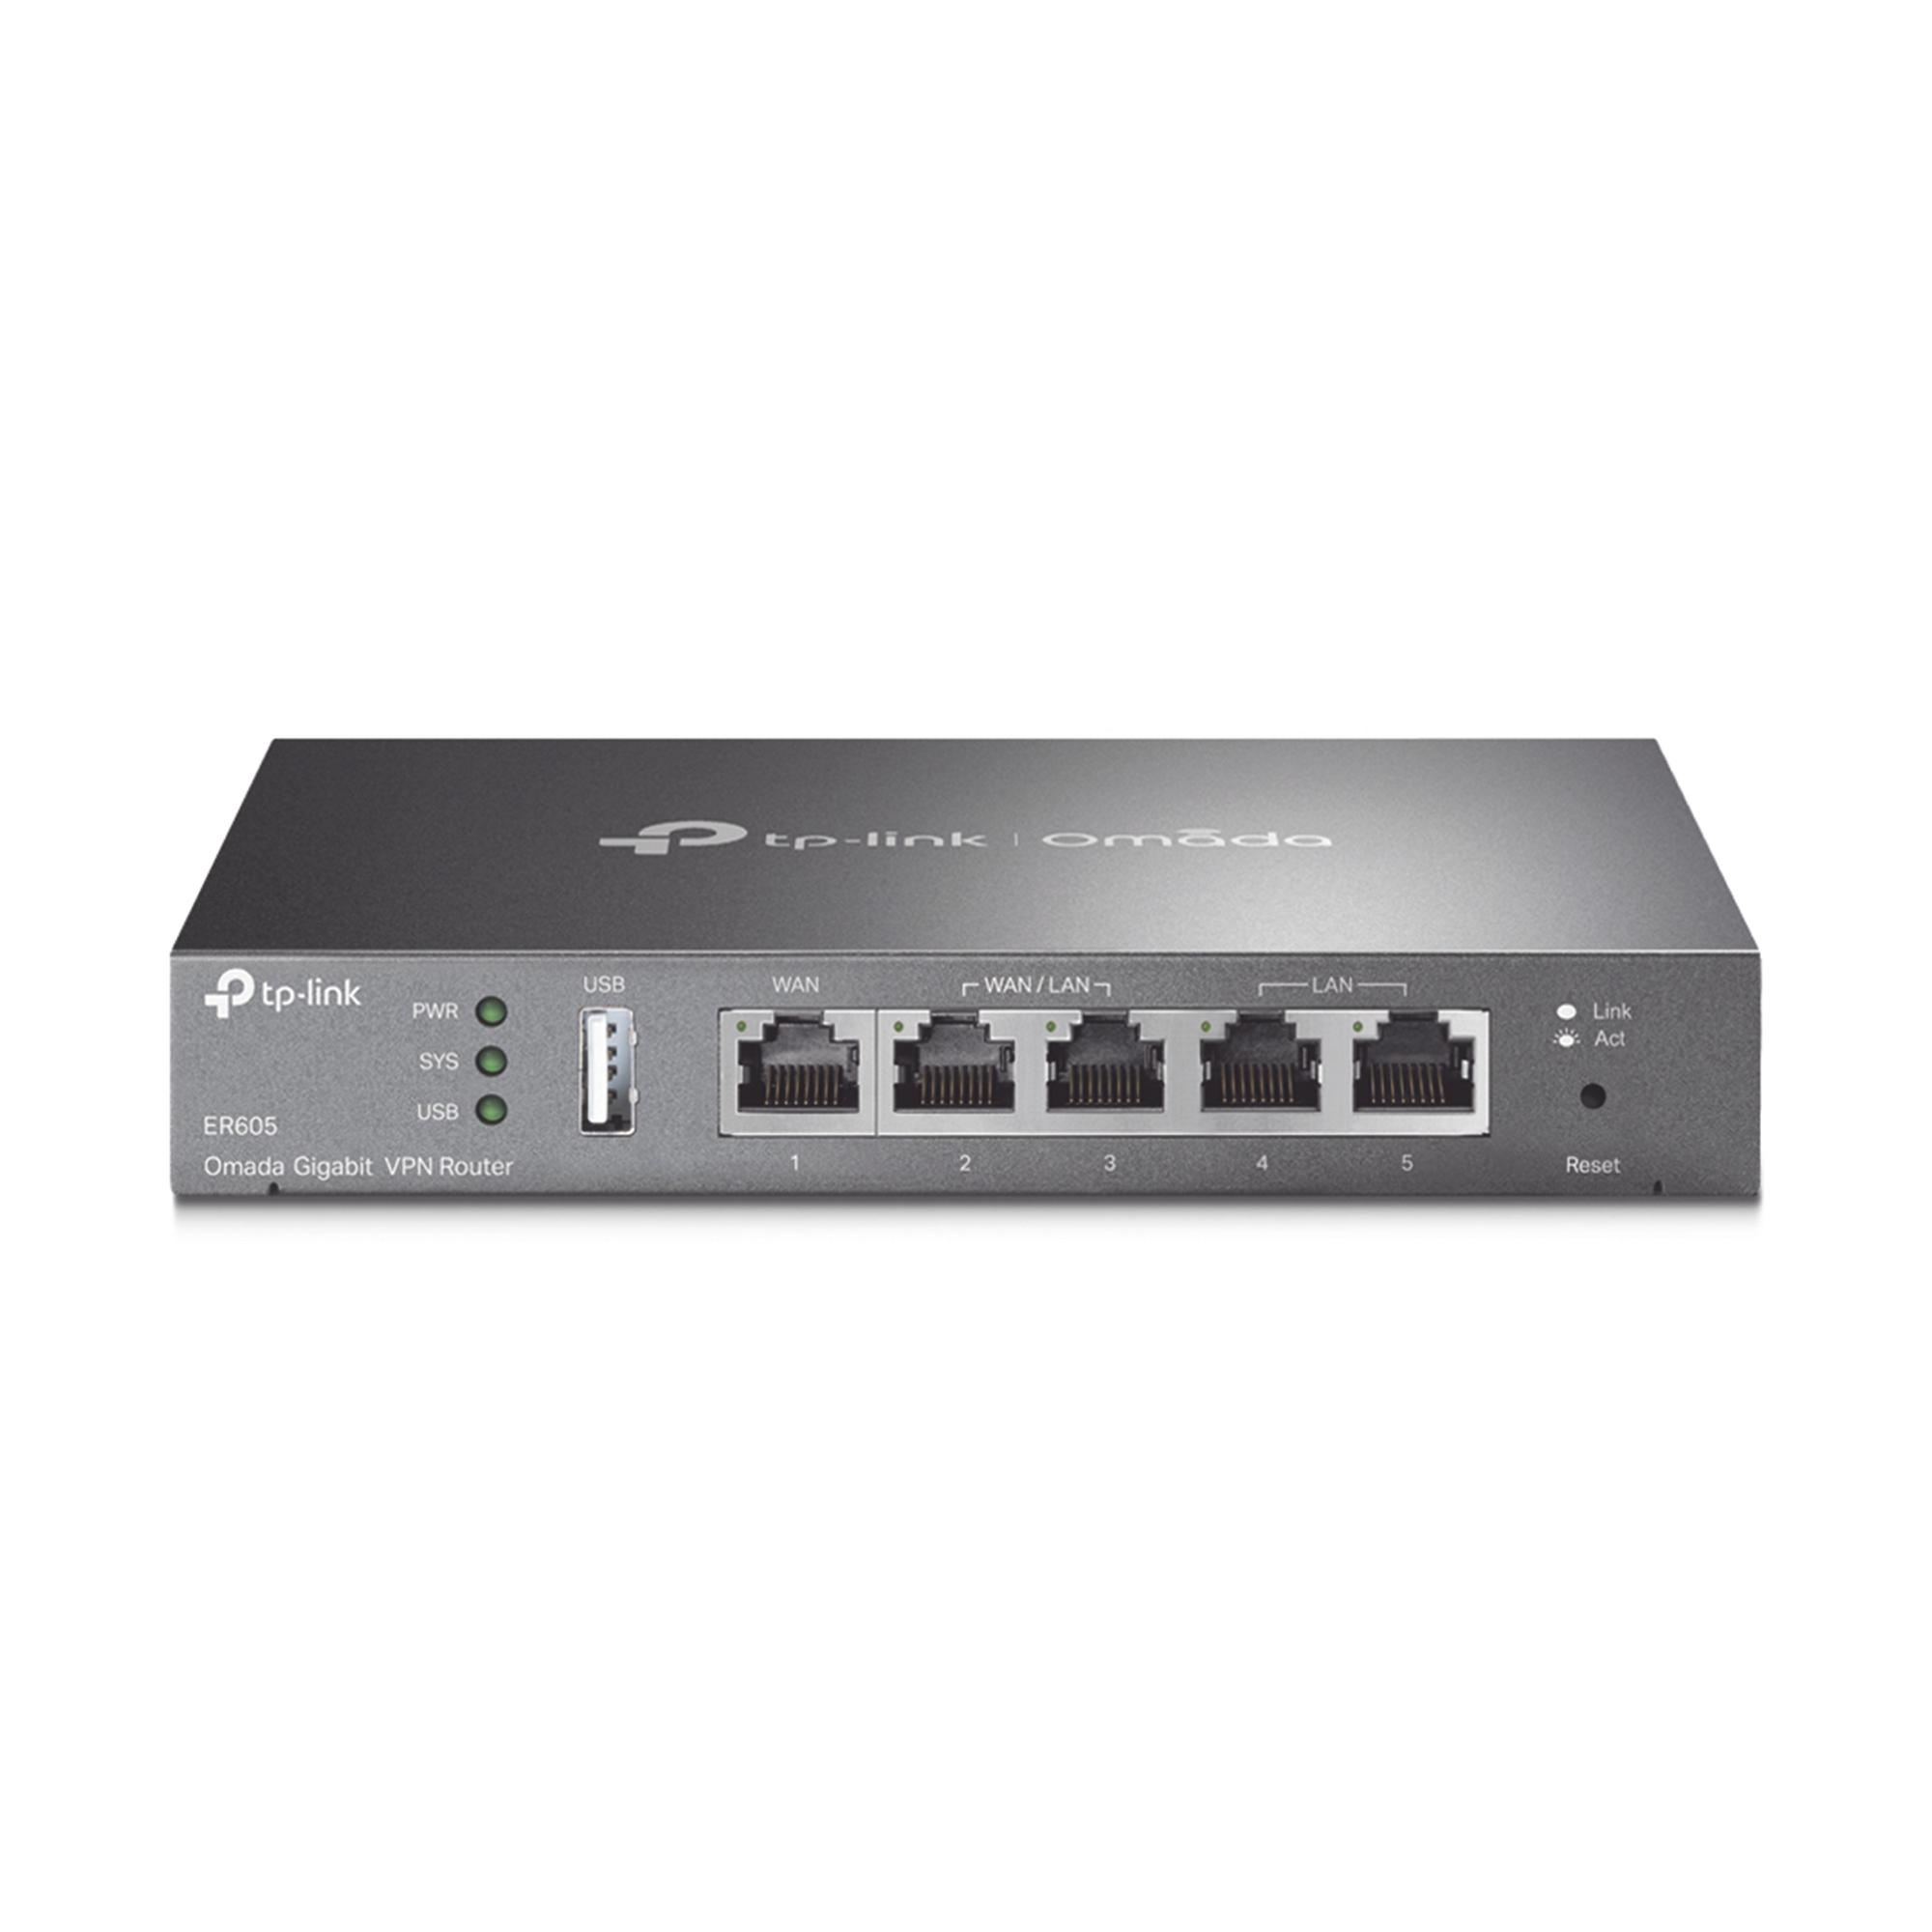 Router VPN - SDN Multi-WAN Gigabit, 1 puerto LAN Gigabit, 1 puerto WAN Gigabit, 3 puertos Auto configurables LAN/WAN, 25,000 Sesiones Concurrentes, Administración Centralizada OMADA SDN